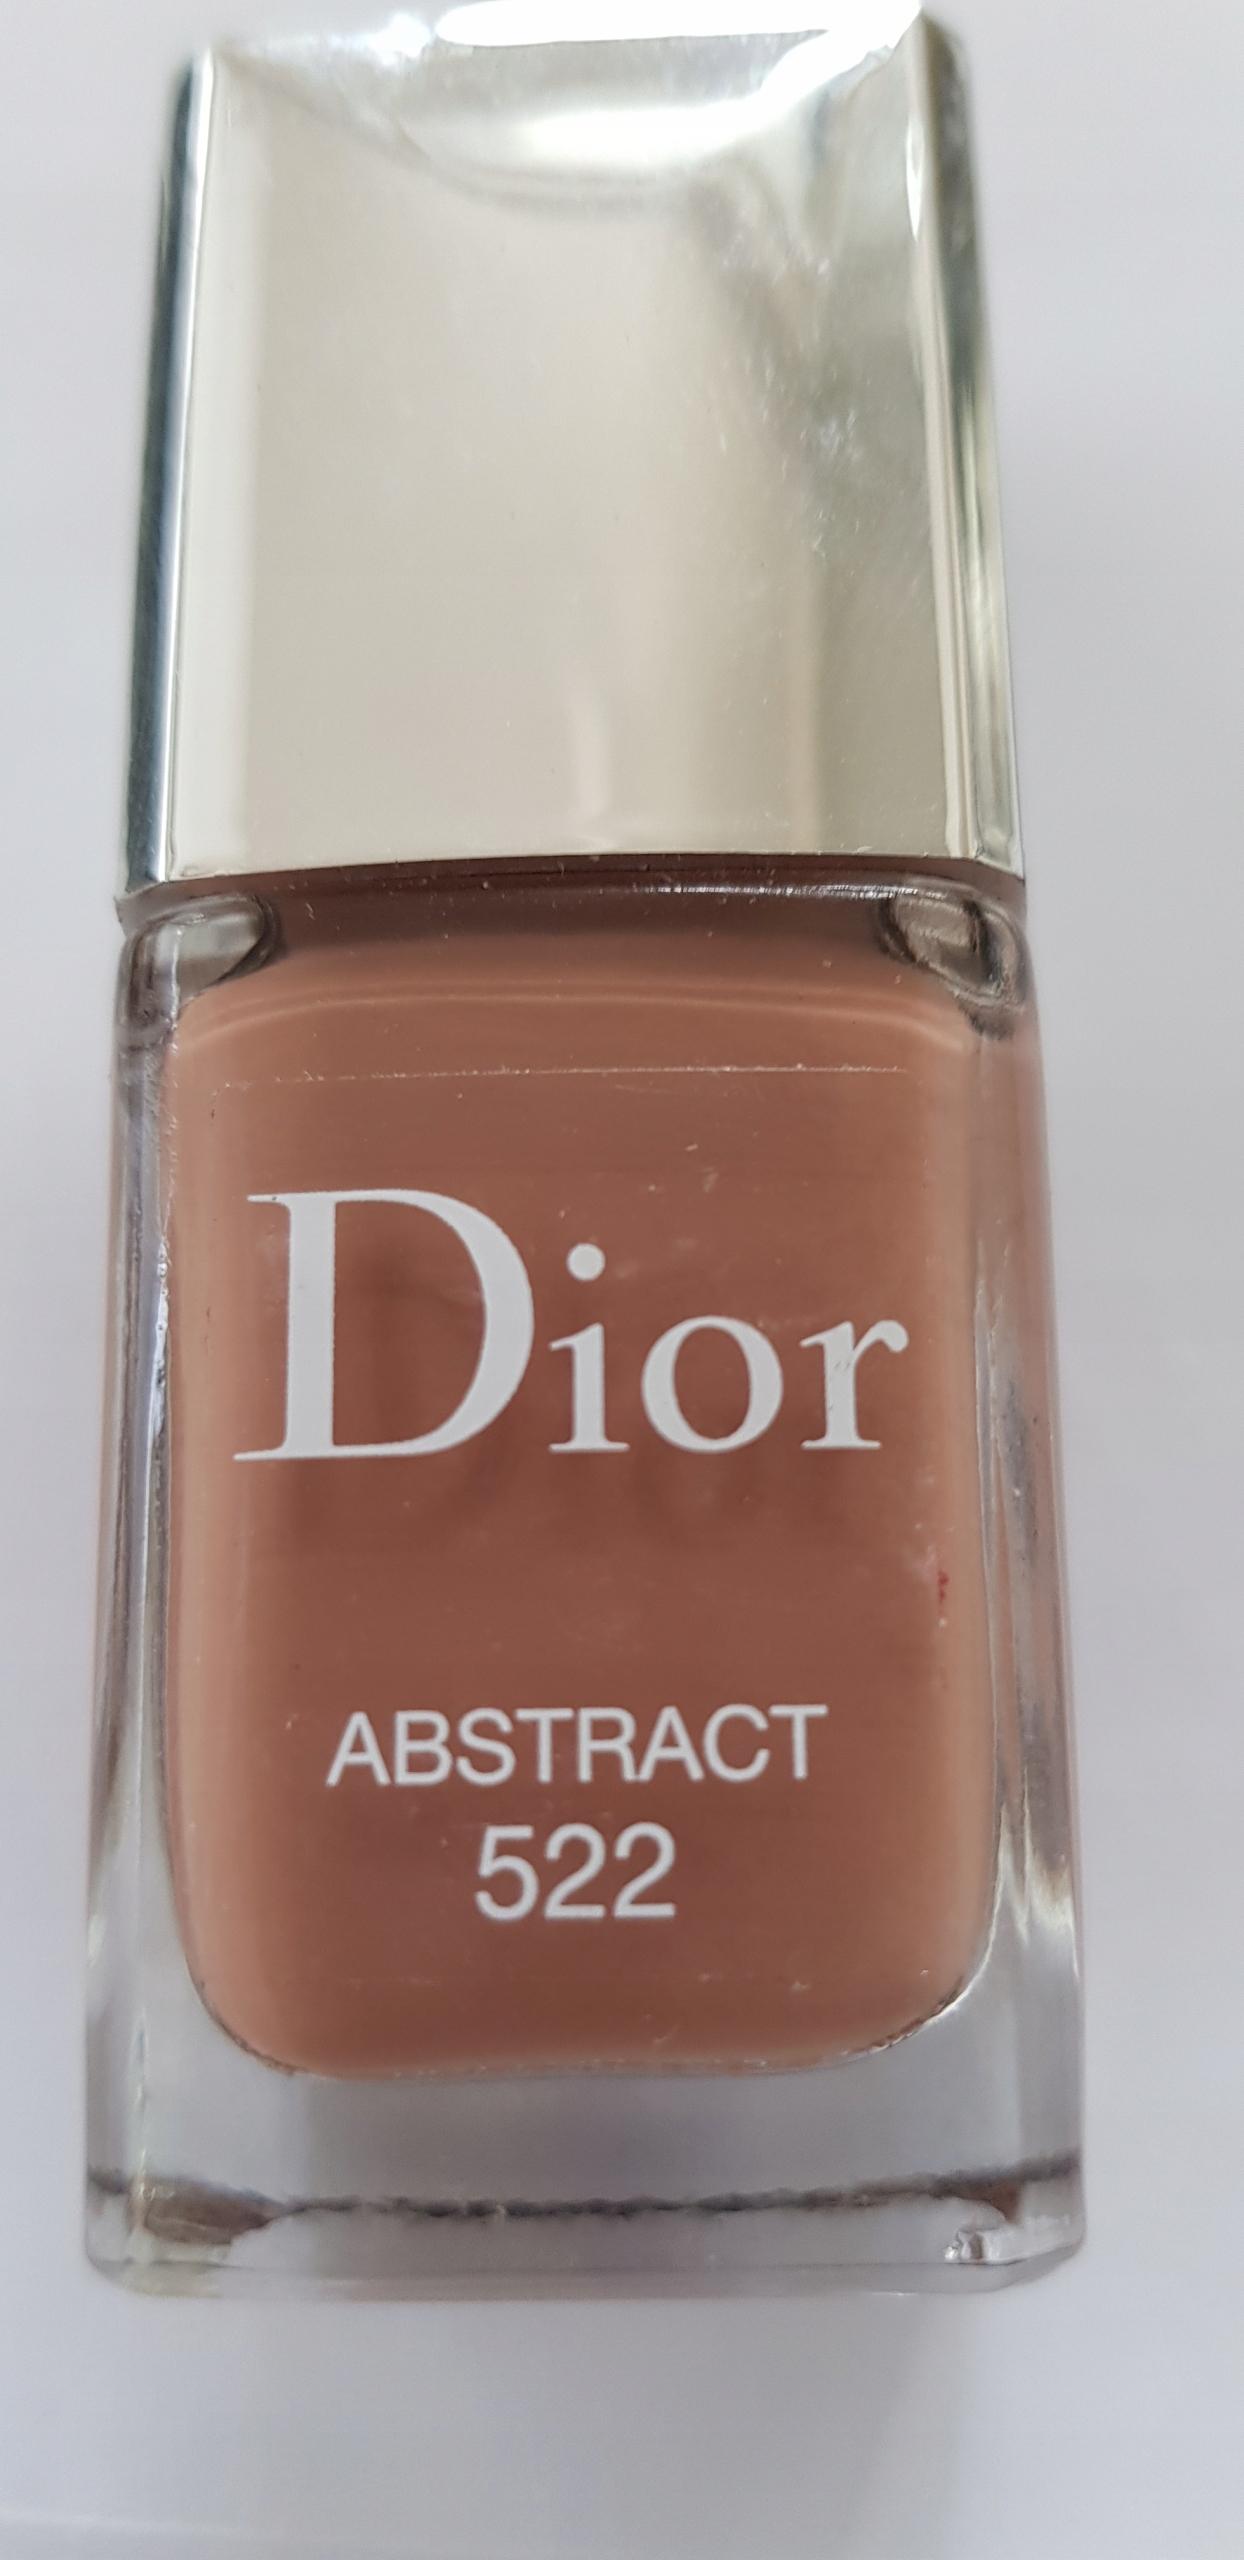 Dior Vernis Abstract 522 lakier do paznokci